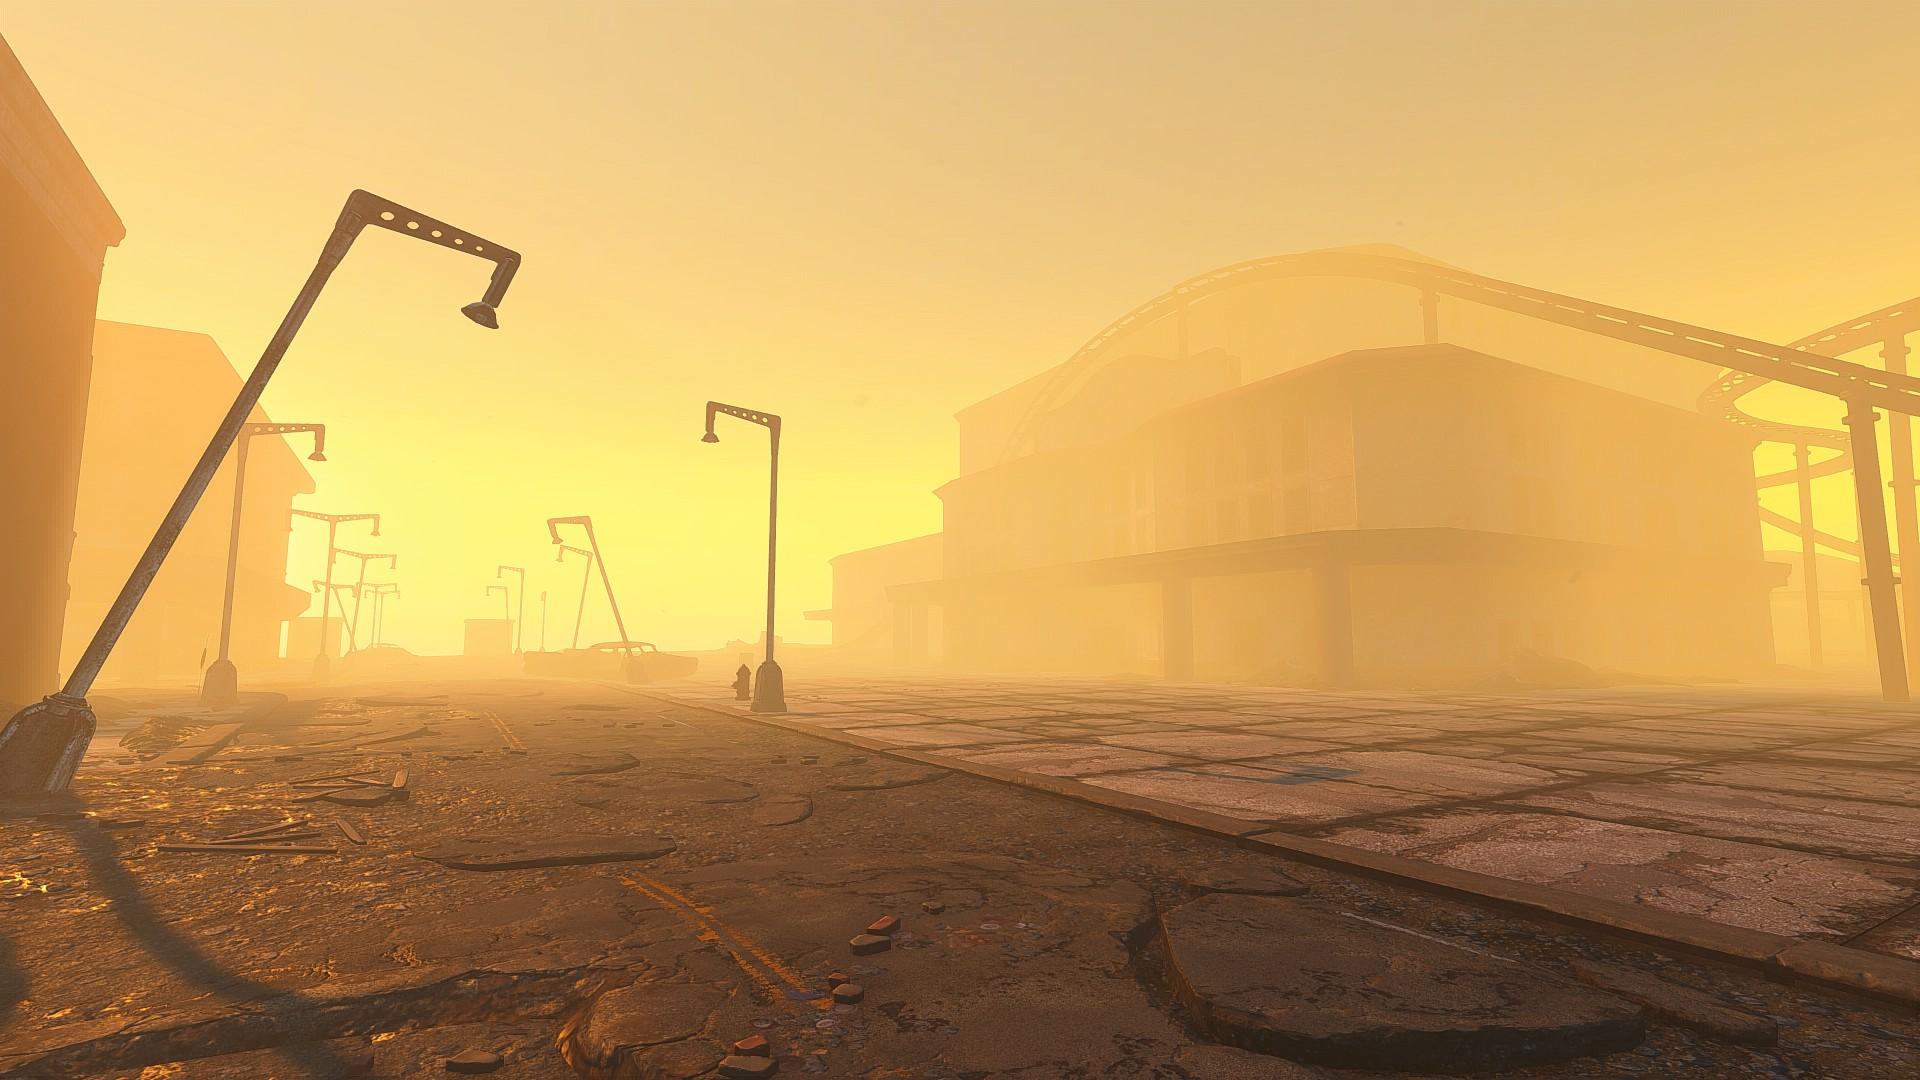 More Buildings Fallout  Mod